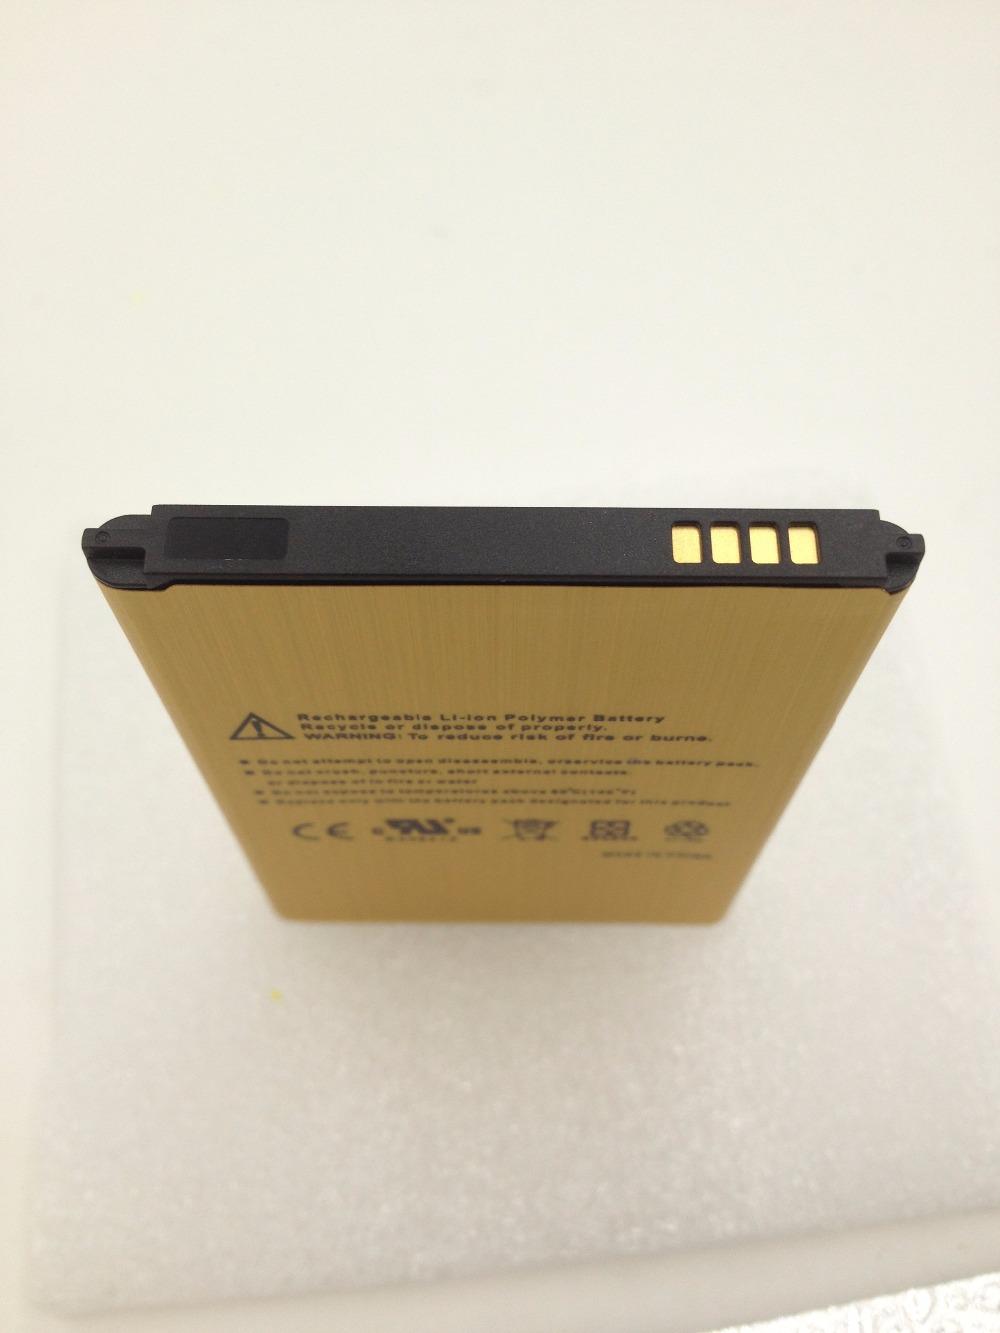 4500mAh Golden Standard Li ion Battery For Samsung Galaxy Note 3 III N9000 N9005 N9002 N900